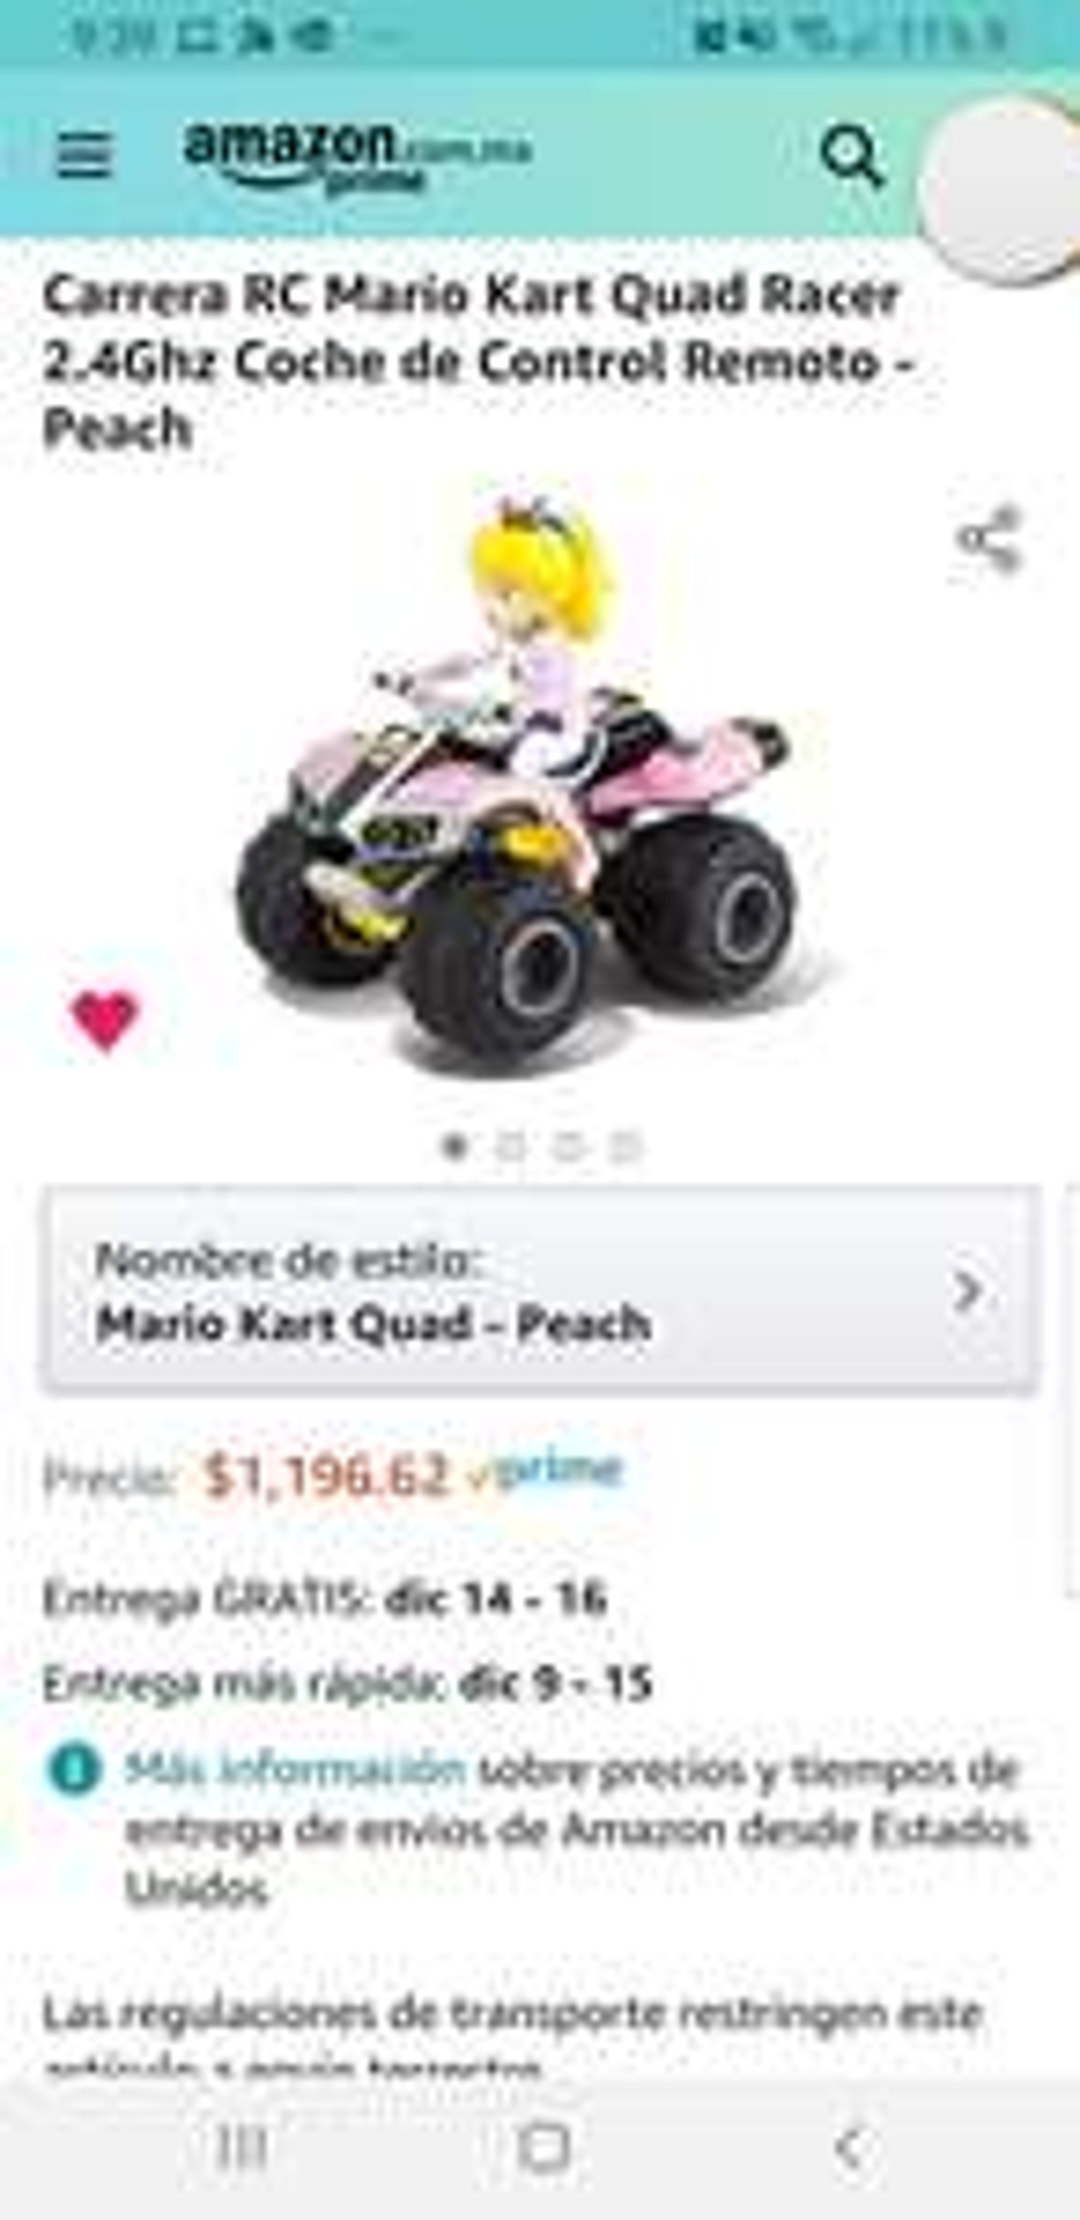 Amazon: Mario Kart Coche de Control Remoto - Peach